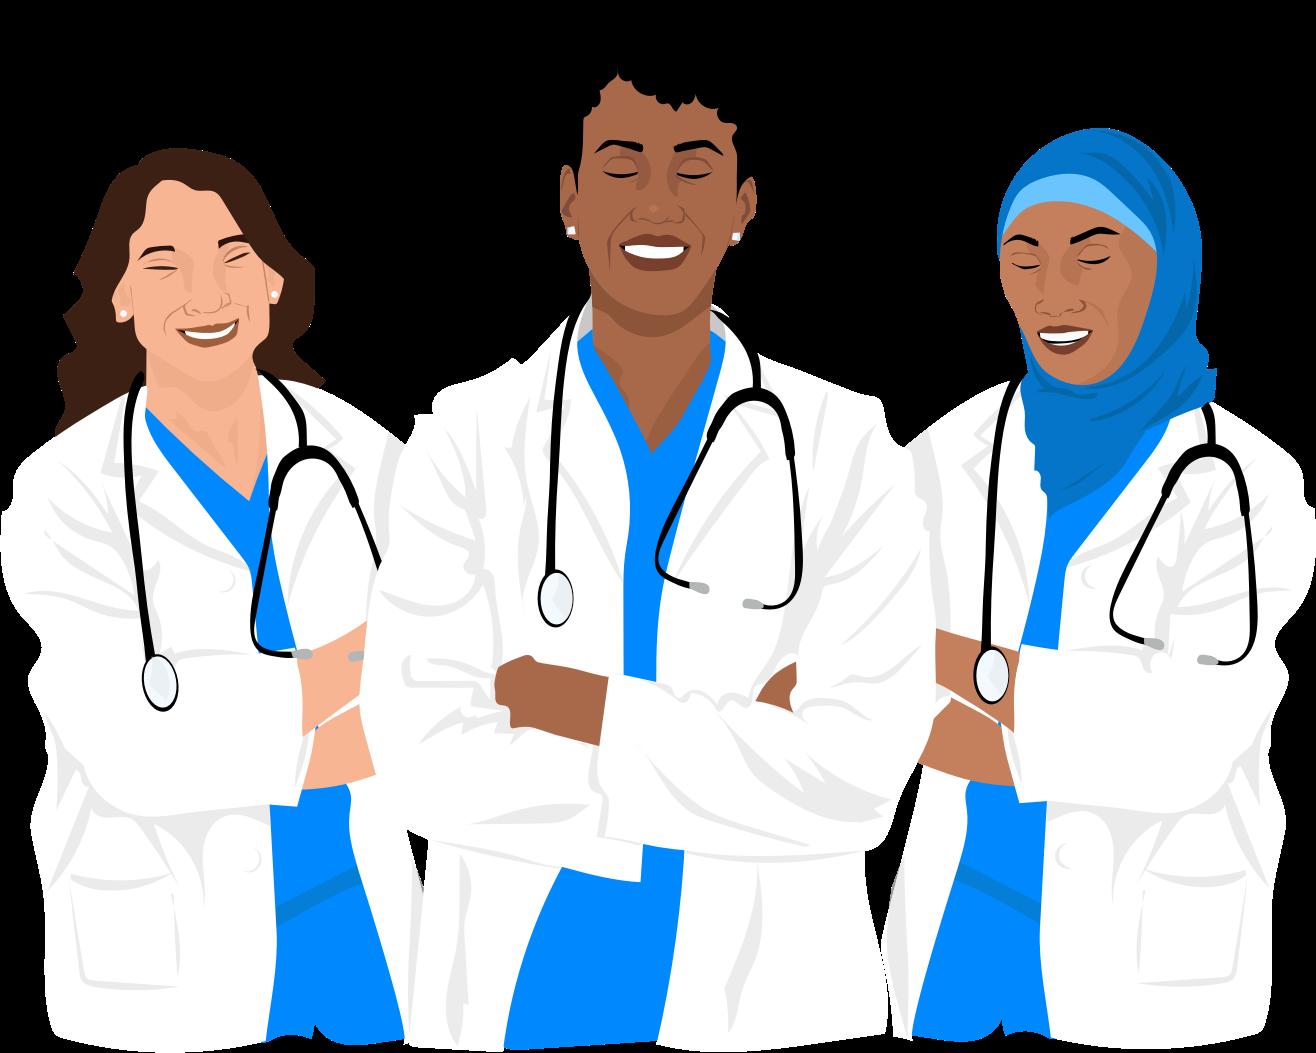 kiira multicultural clinicians